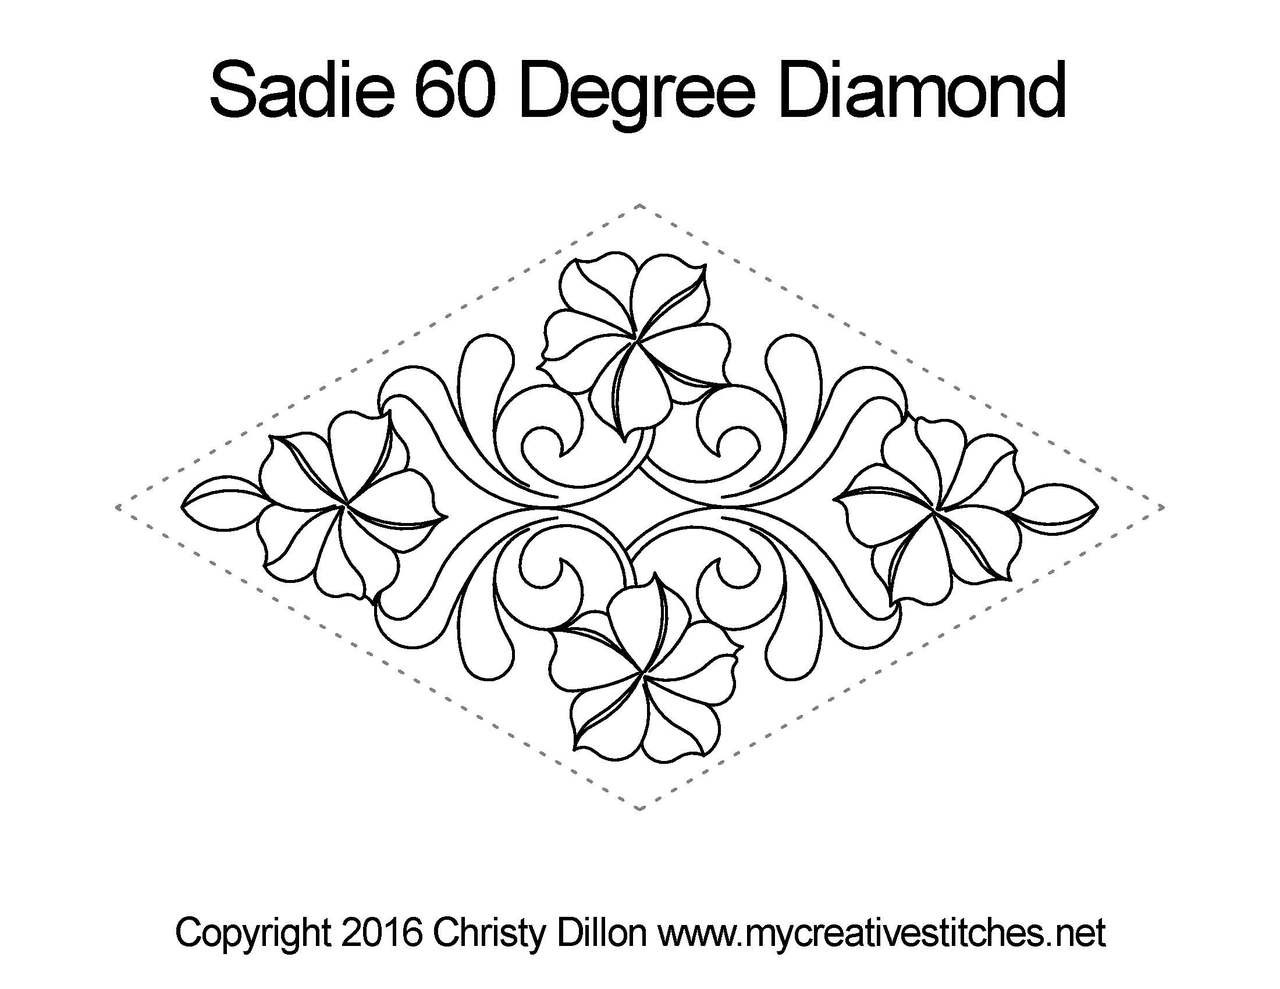 Computerized Quilting Pattern Sadie 60 Degree Diamond Block